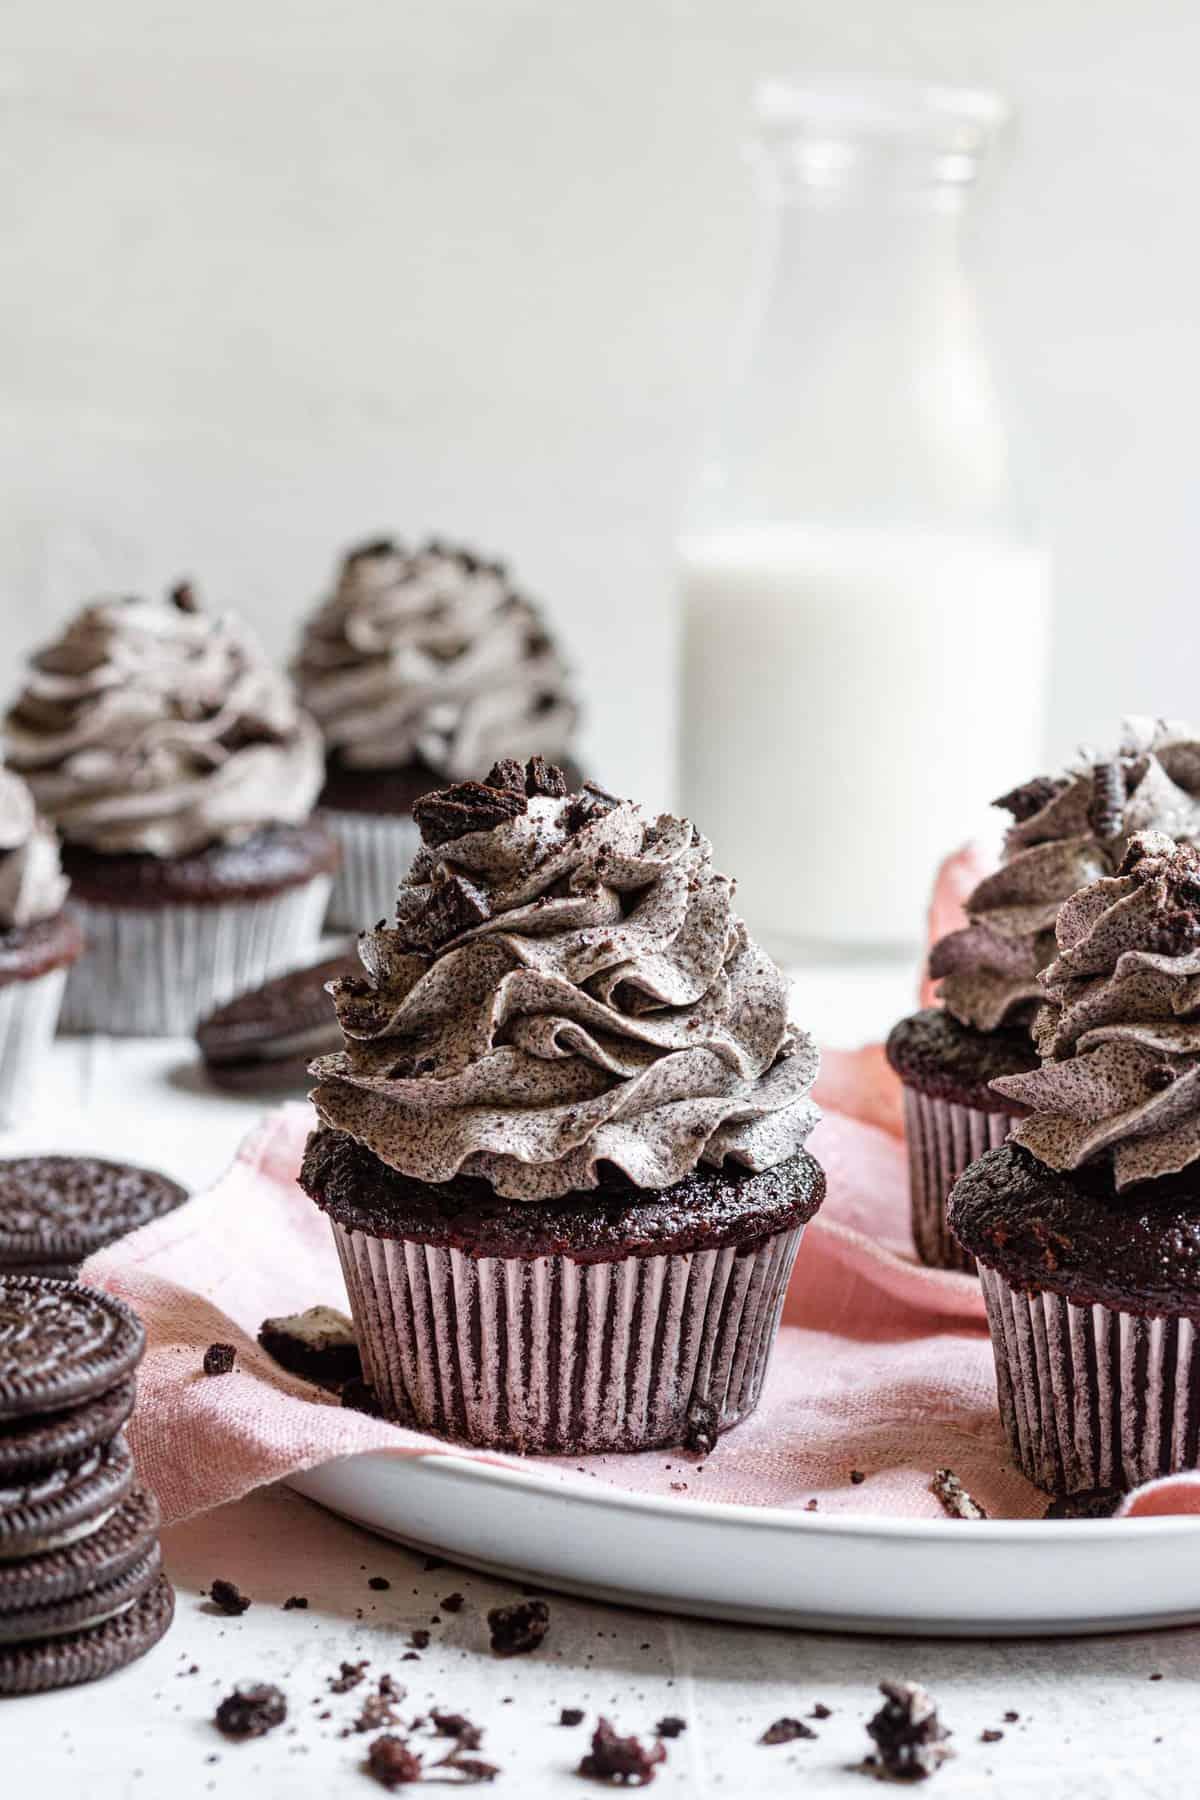 Chocolate Cupcakes with Oreo Buttercream